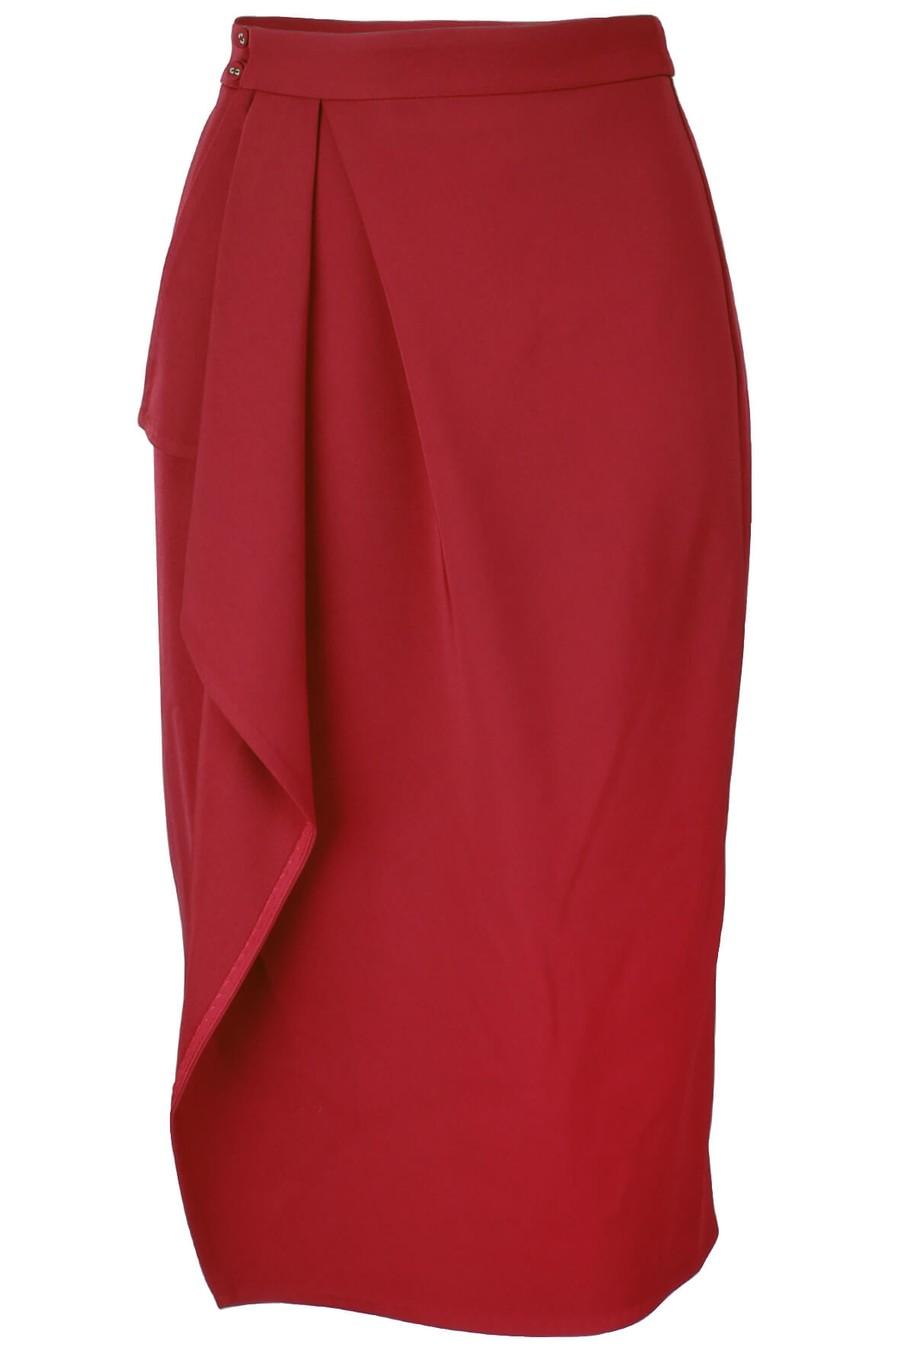 Style Theory_aijek-coretta-ruffled-skirt-1